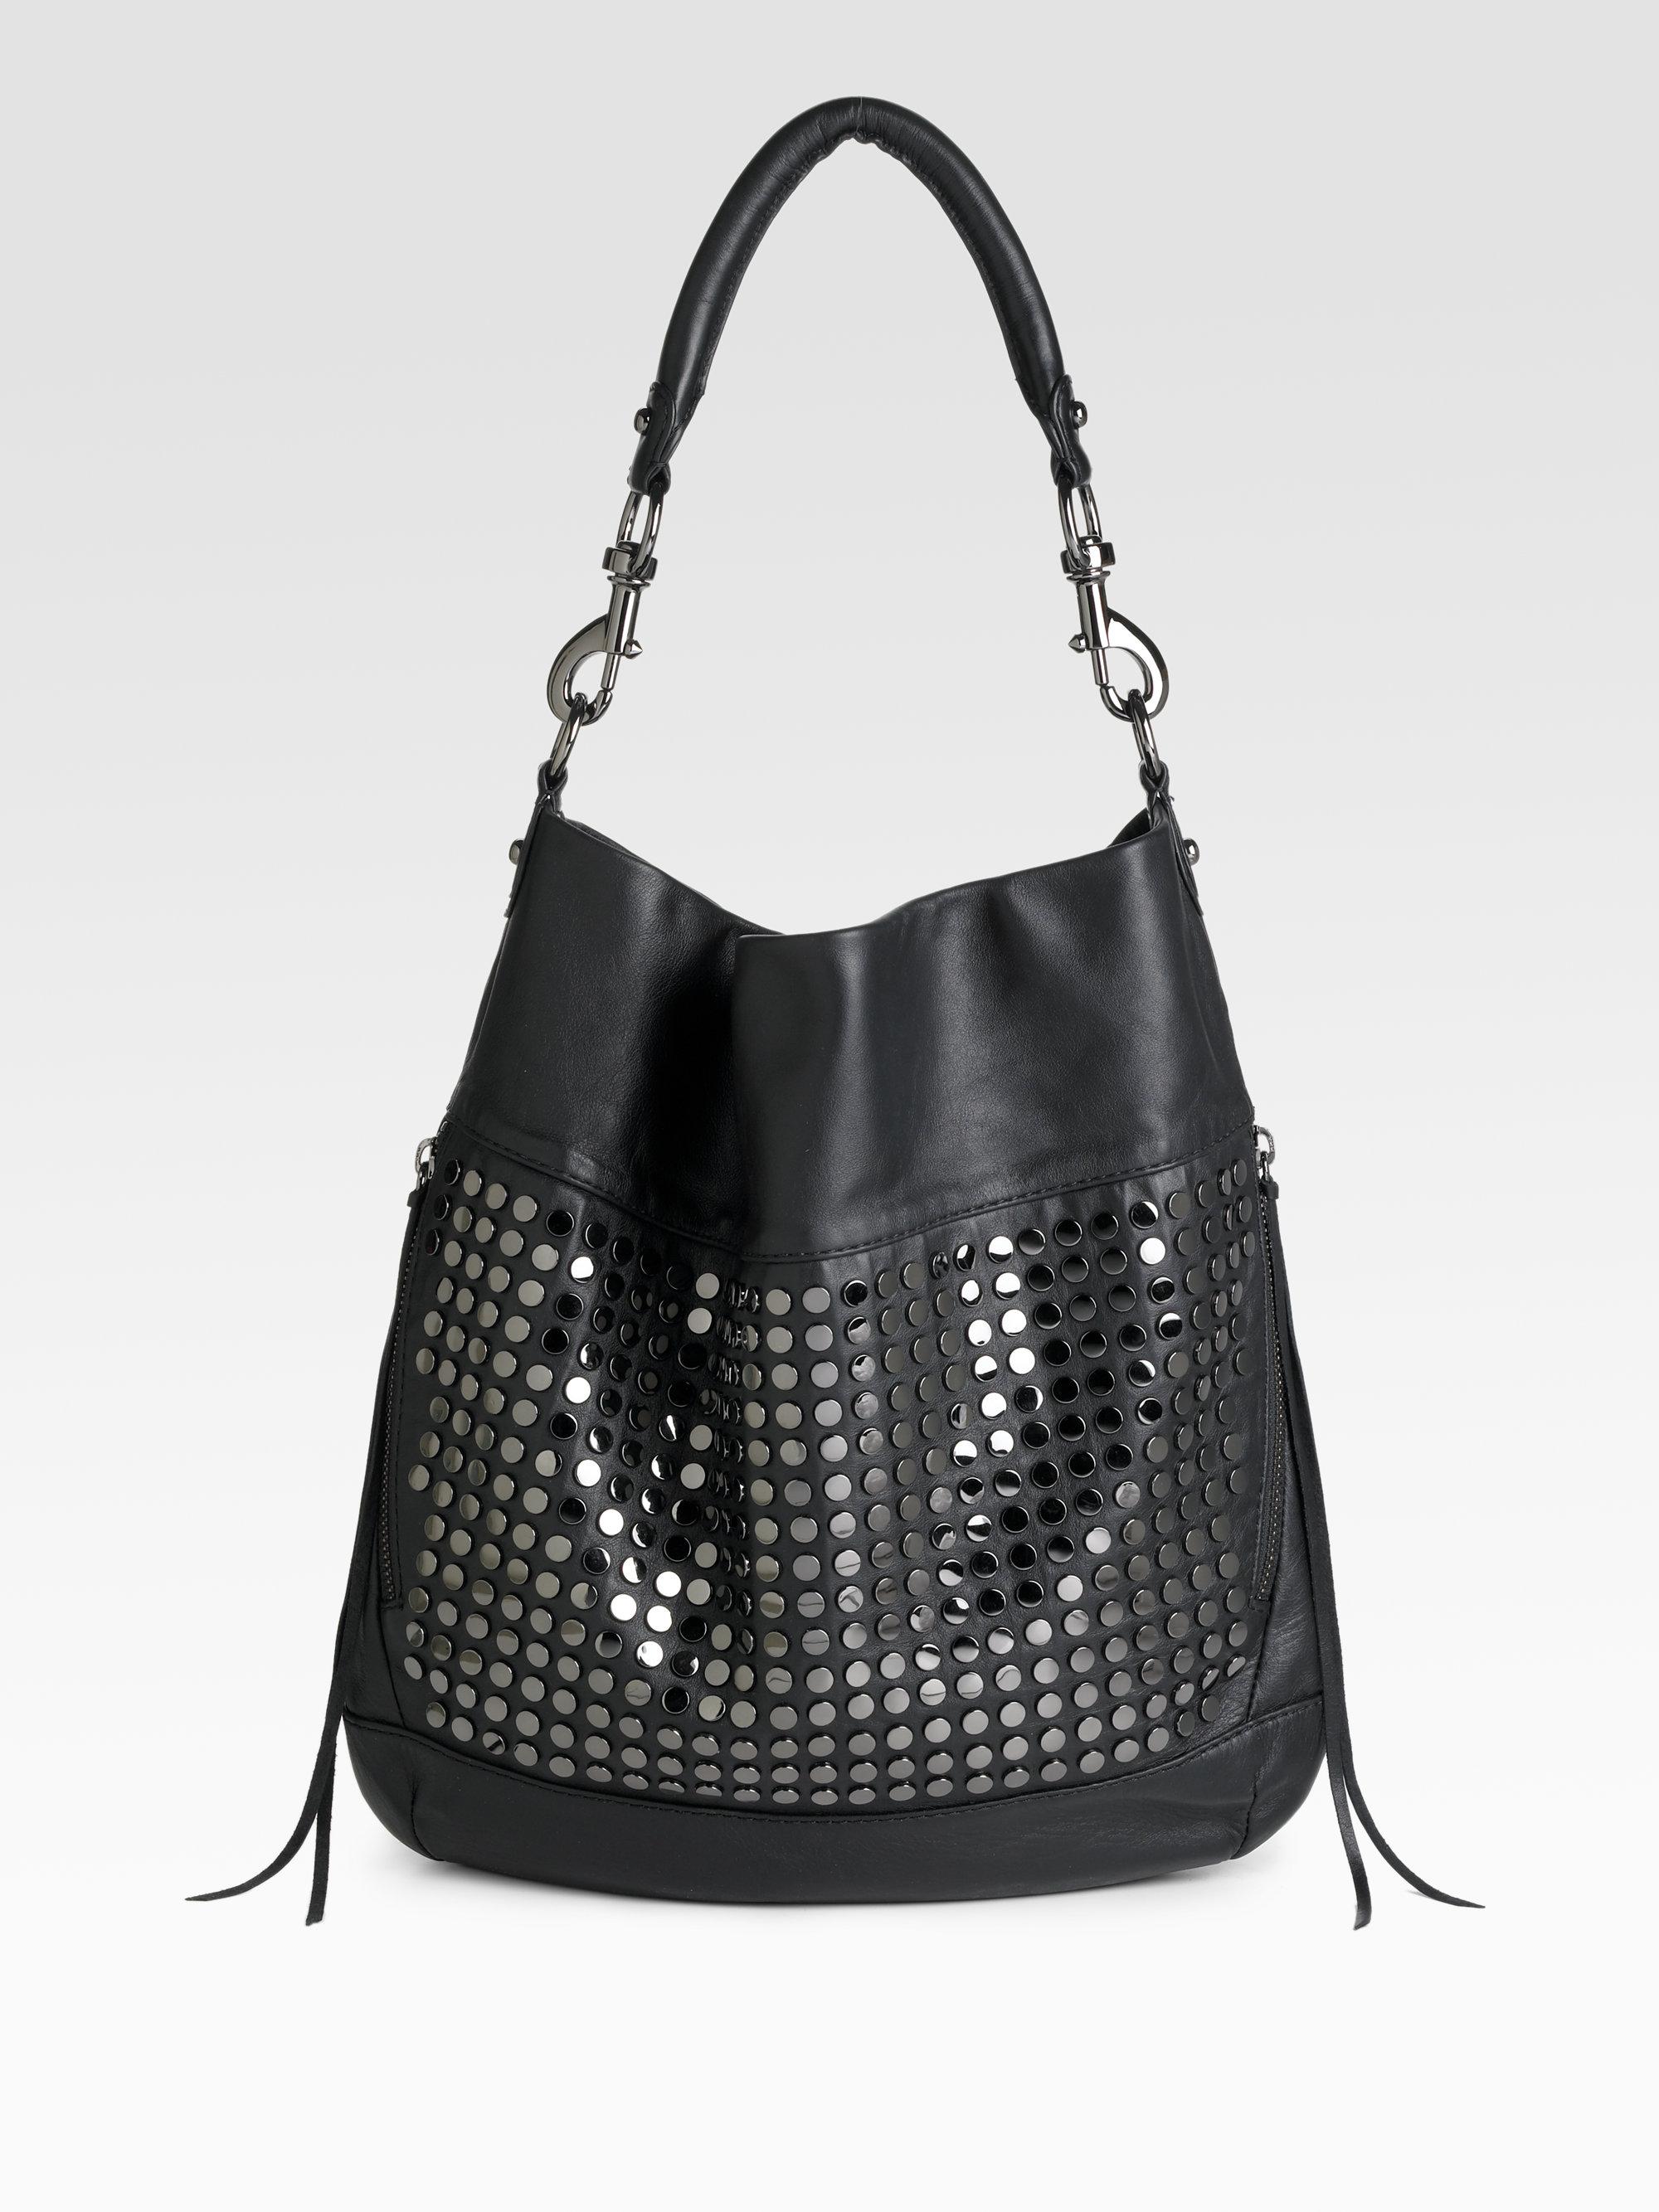 Black Studded Bag H M Confederated